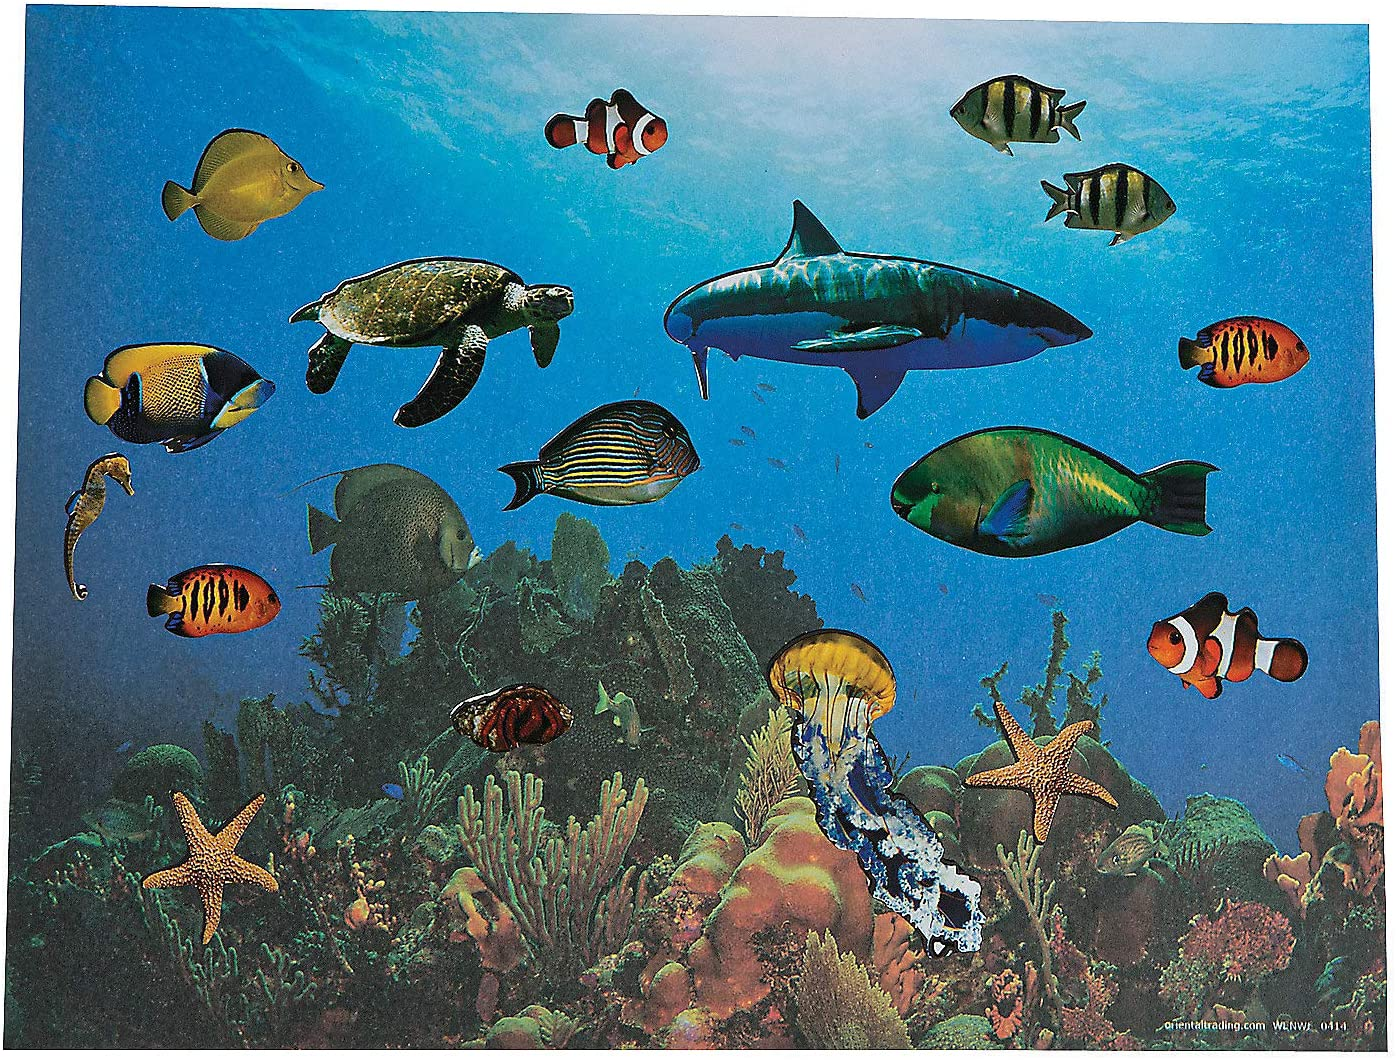 A Under The Sea Realistic Sticker Scene Stickers Stationery Fun Express Scene Lrg Make - 12 Pieces